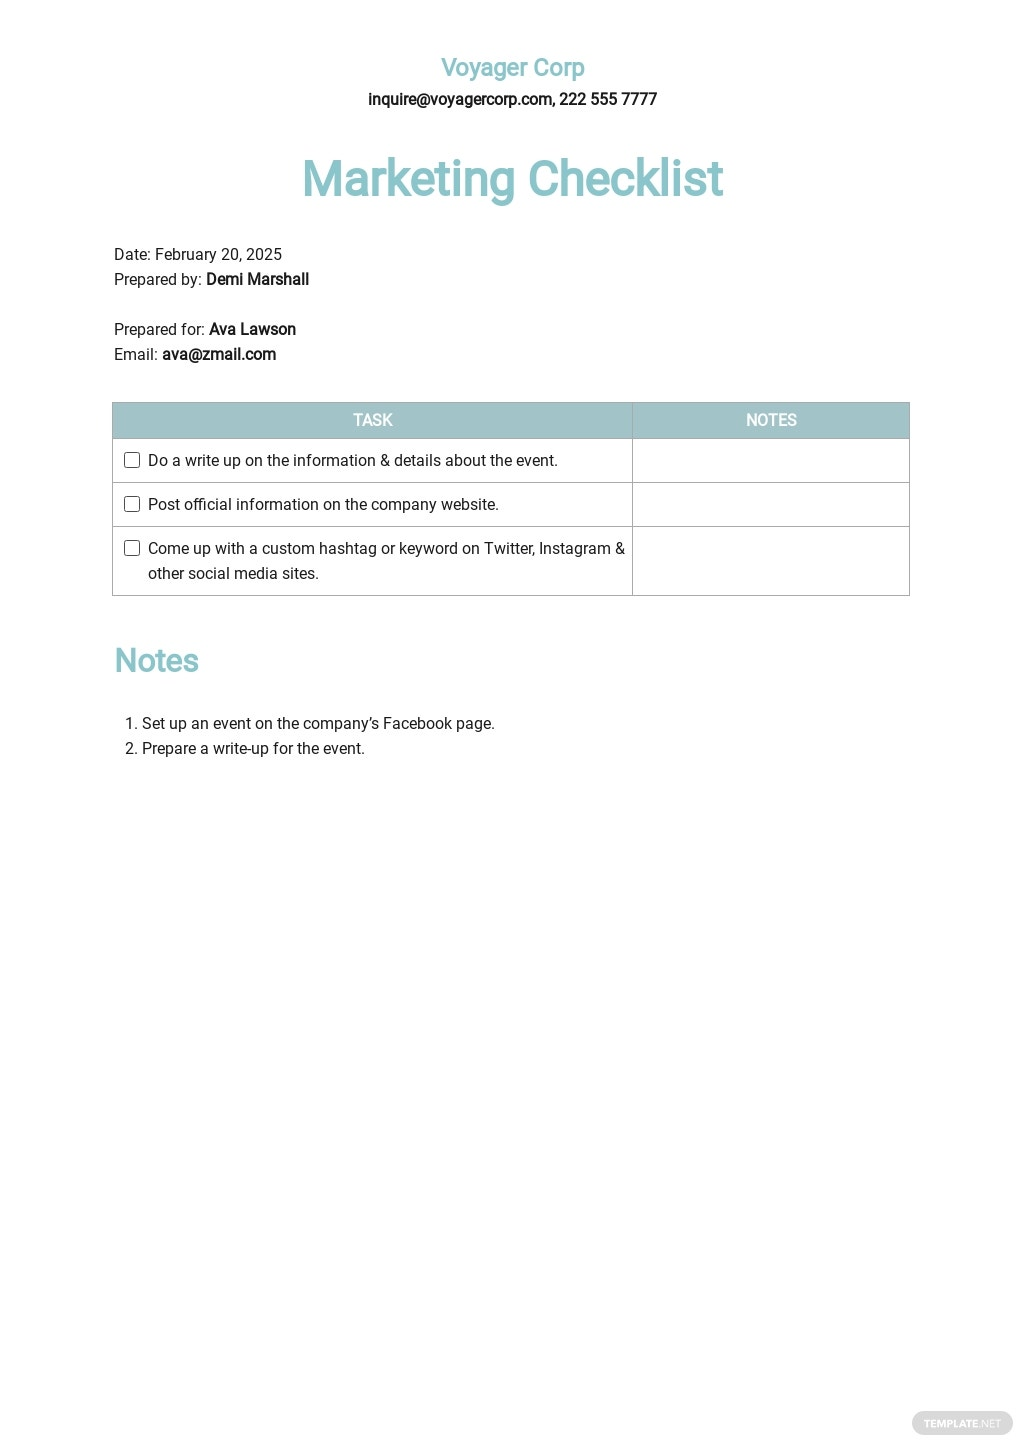 Marketing Checklist Template.jpe